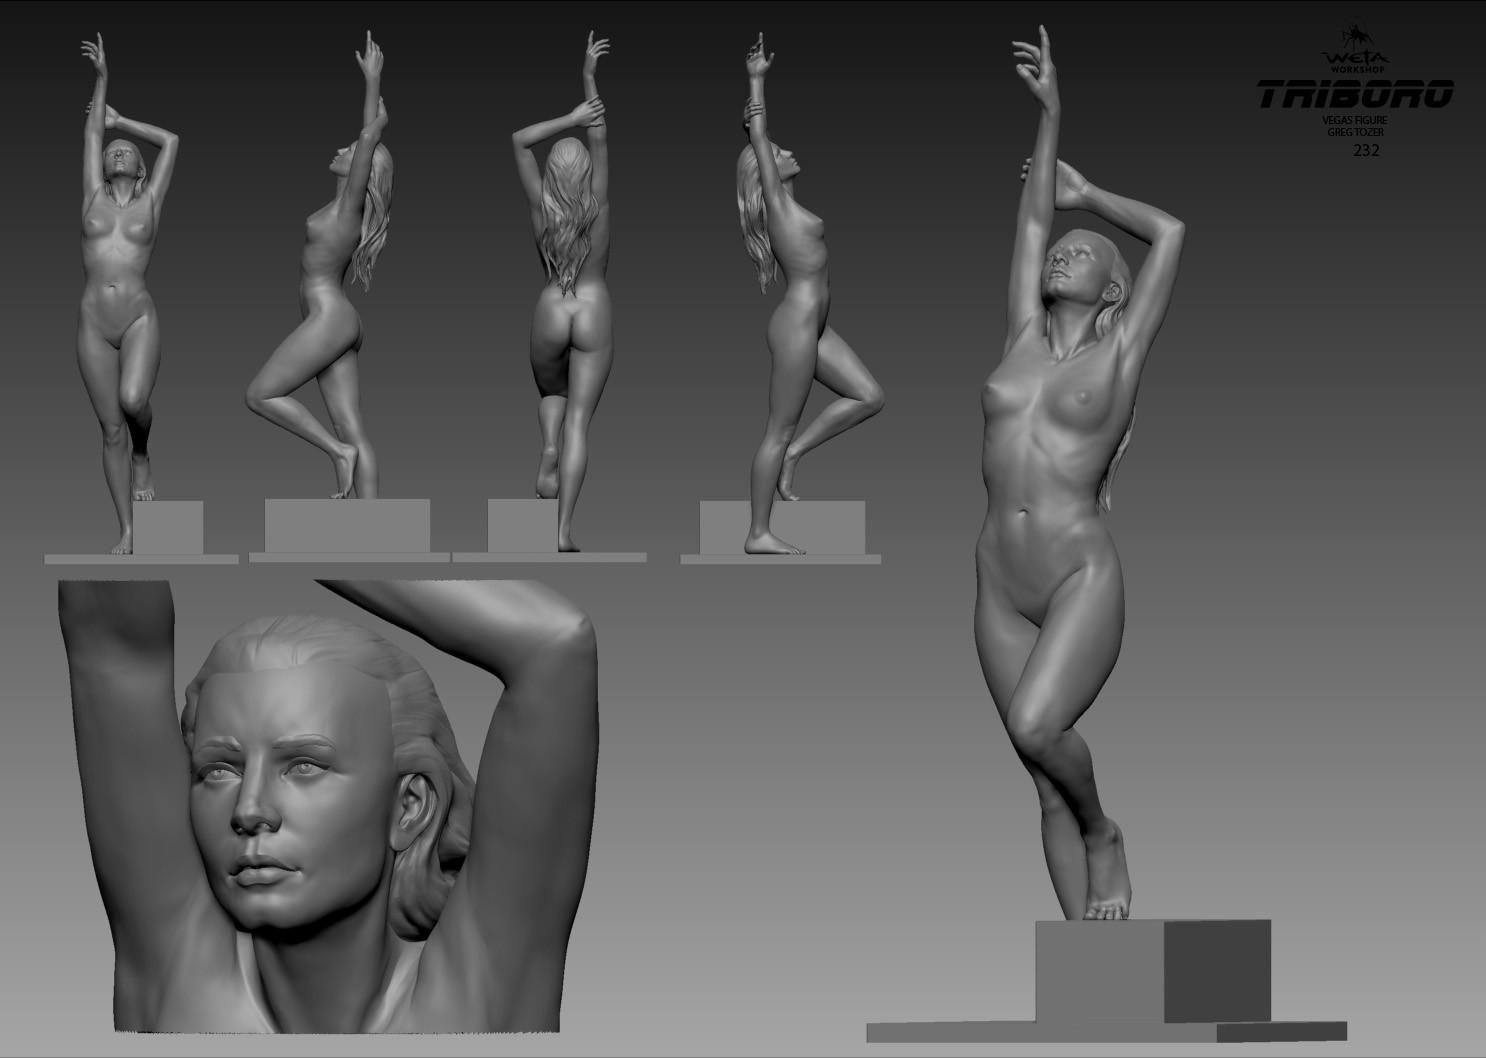 Las Vegas Figure - Artist: Greg Tozer